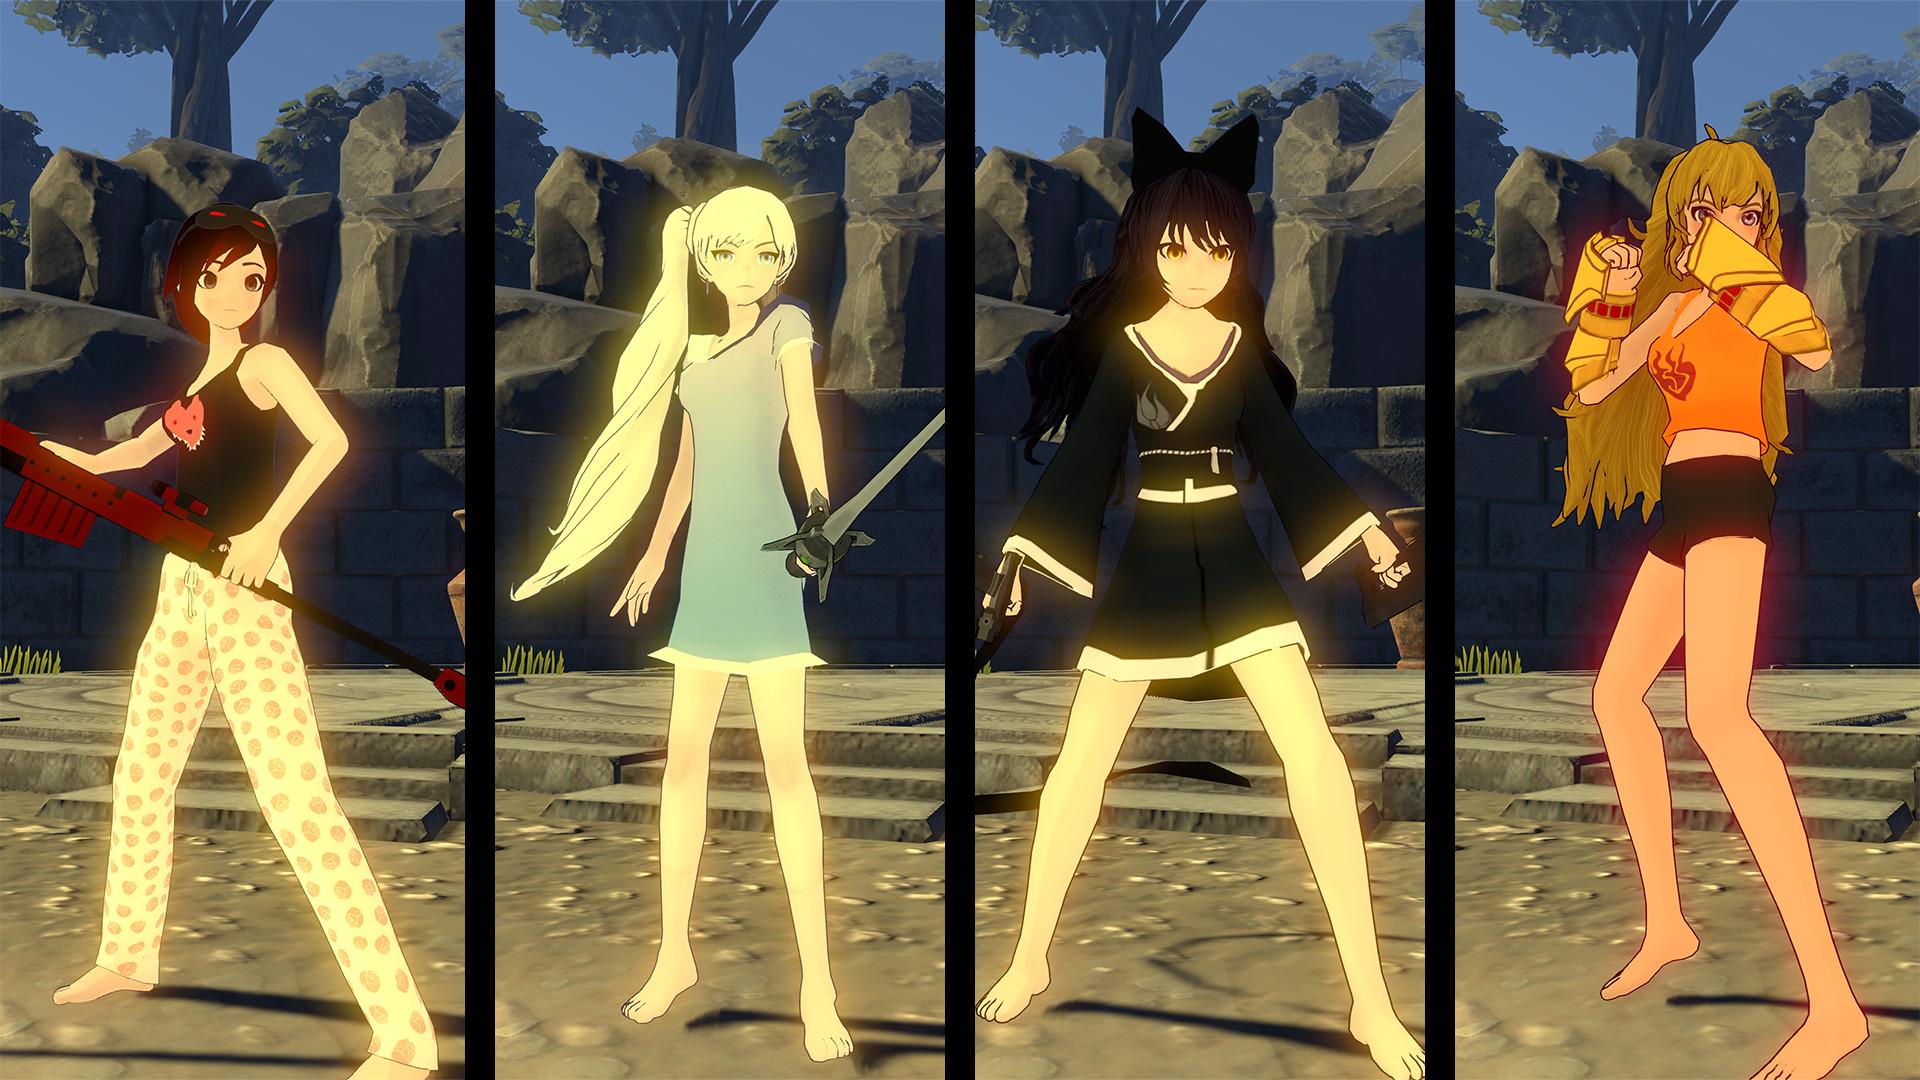 RWBY  Grimm Eclipse - Team RWBY Pajamas Costume Pack on Steam aa9e36648